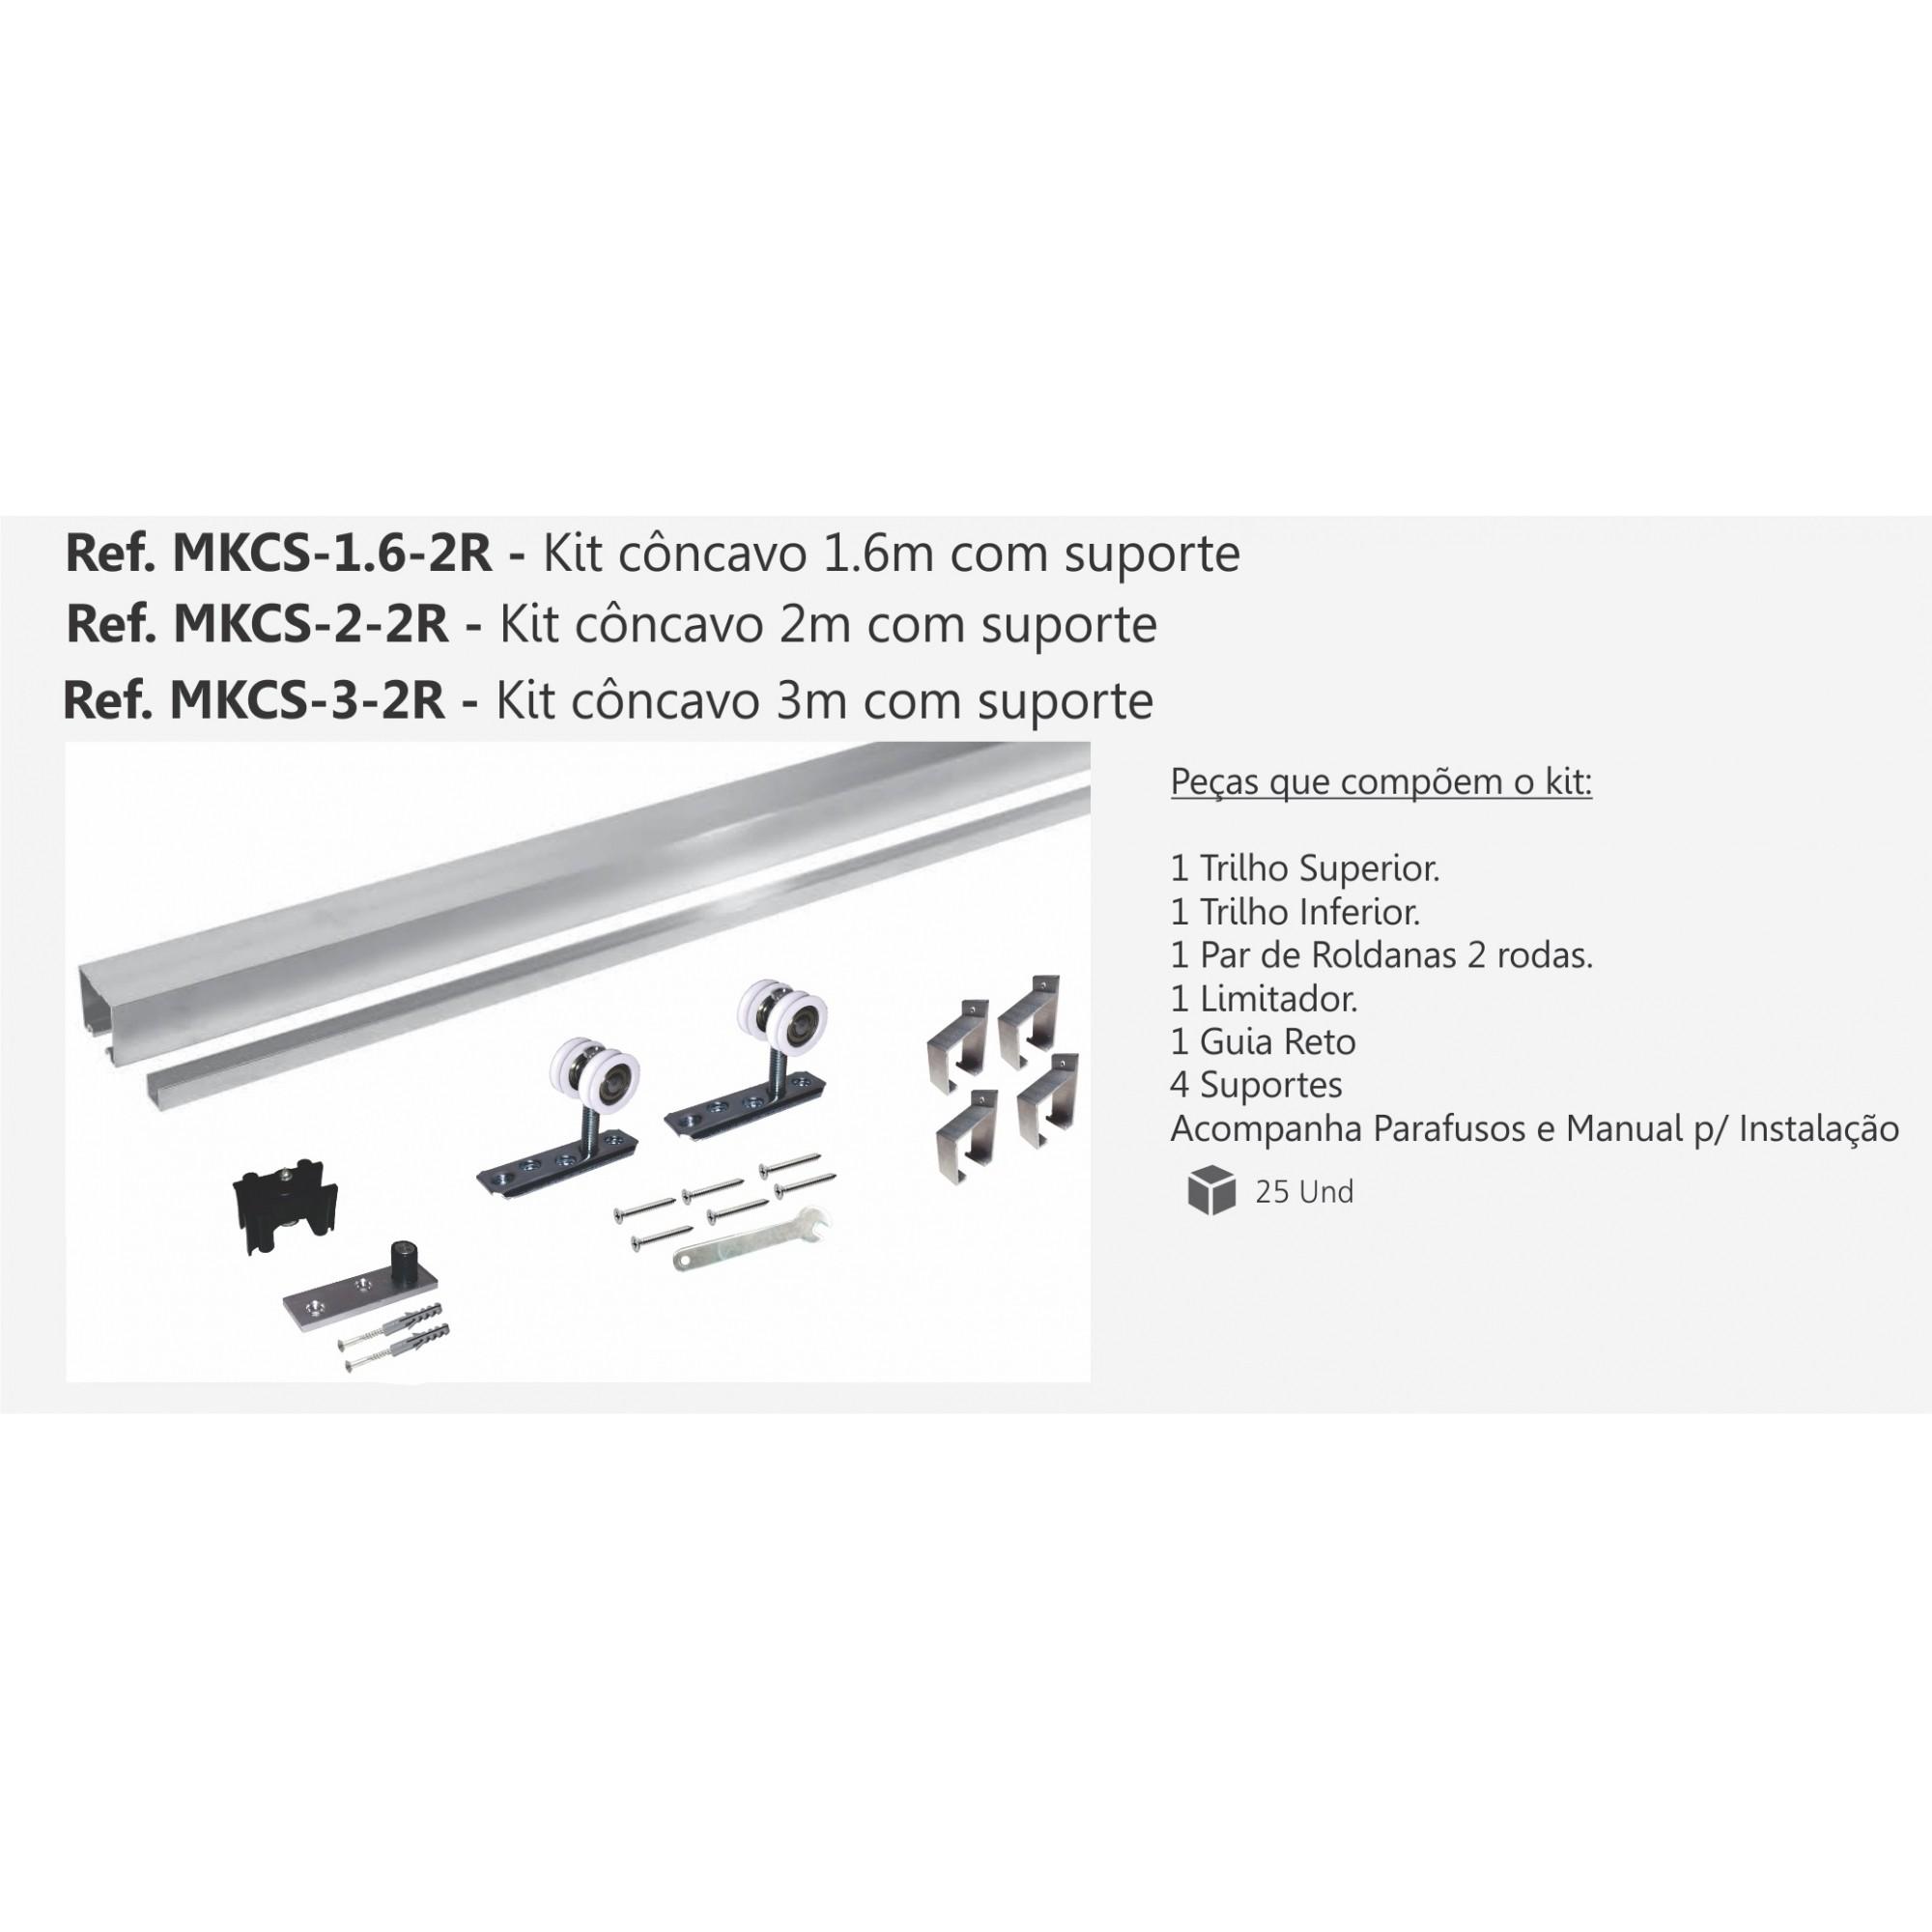 MKCS 2-2R - KIT CONCAVO 2 METROS COM SUPORTE ROLDANA 2R 40KG - PERFIL